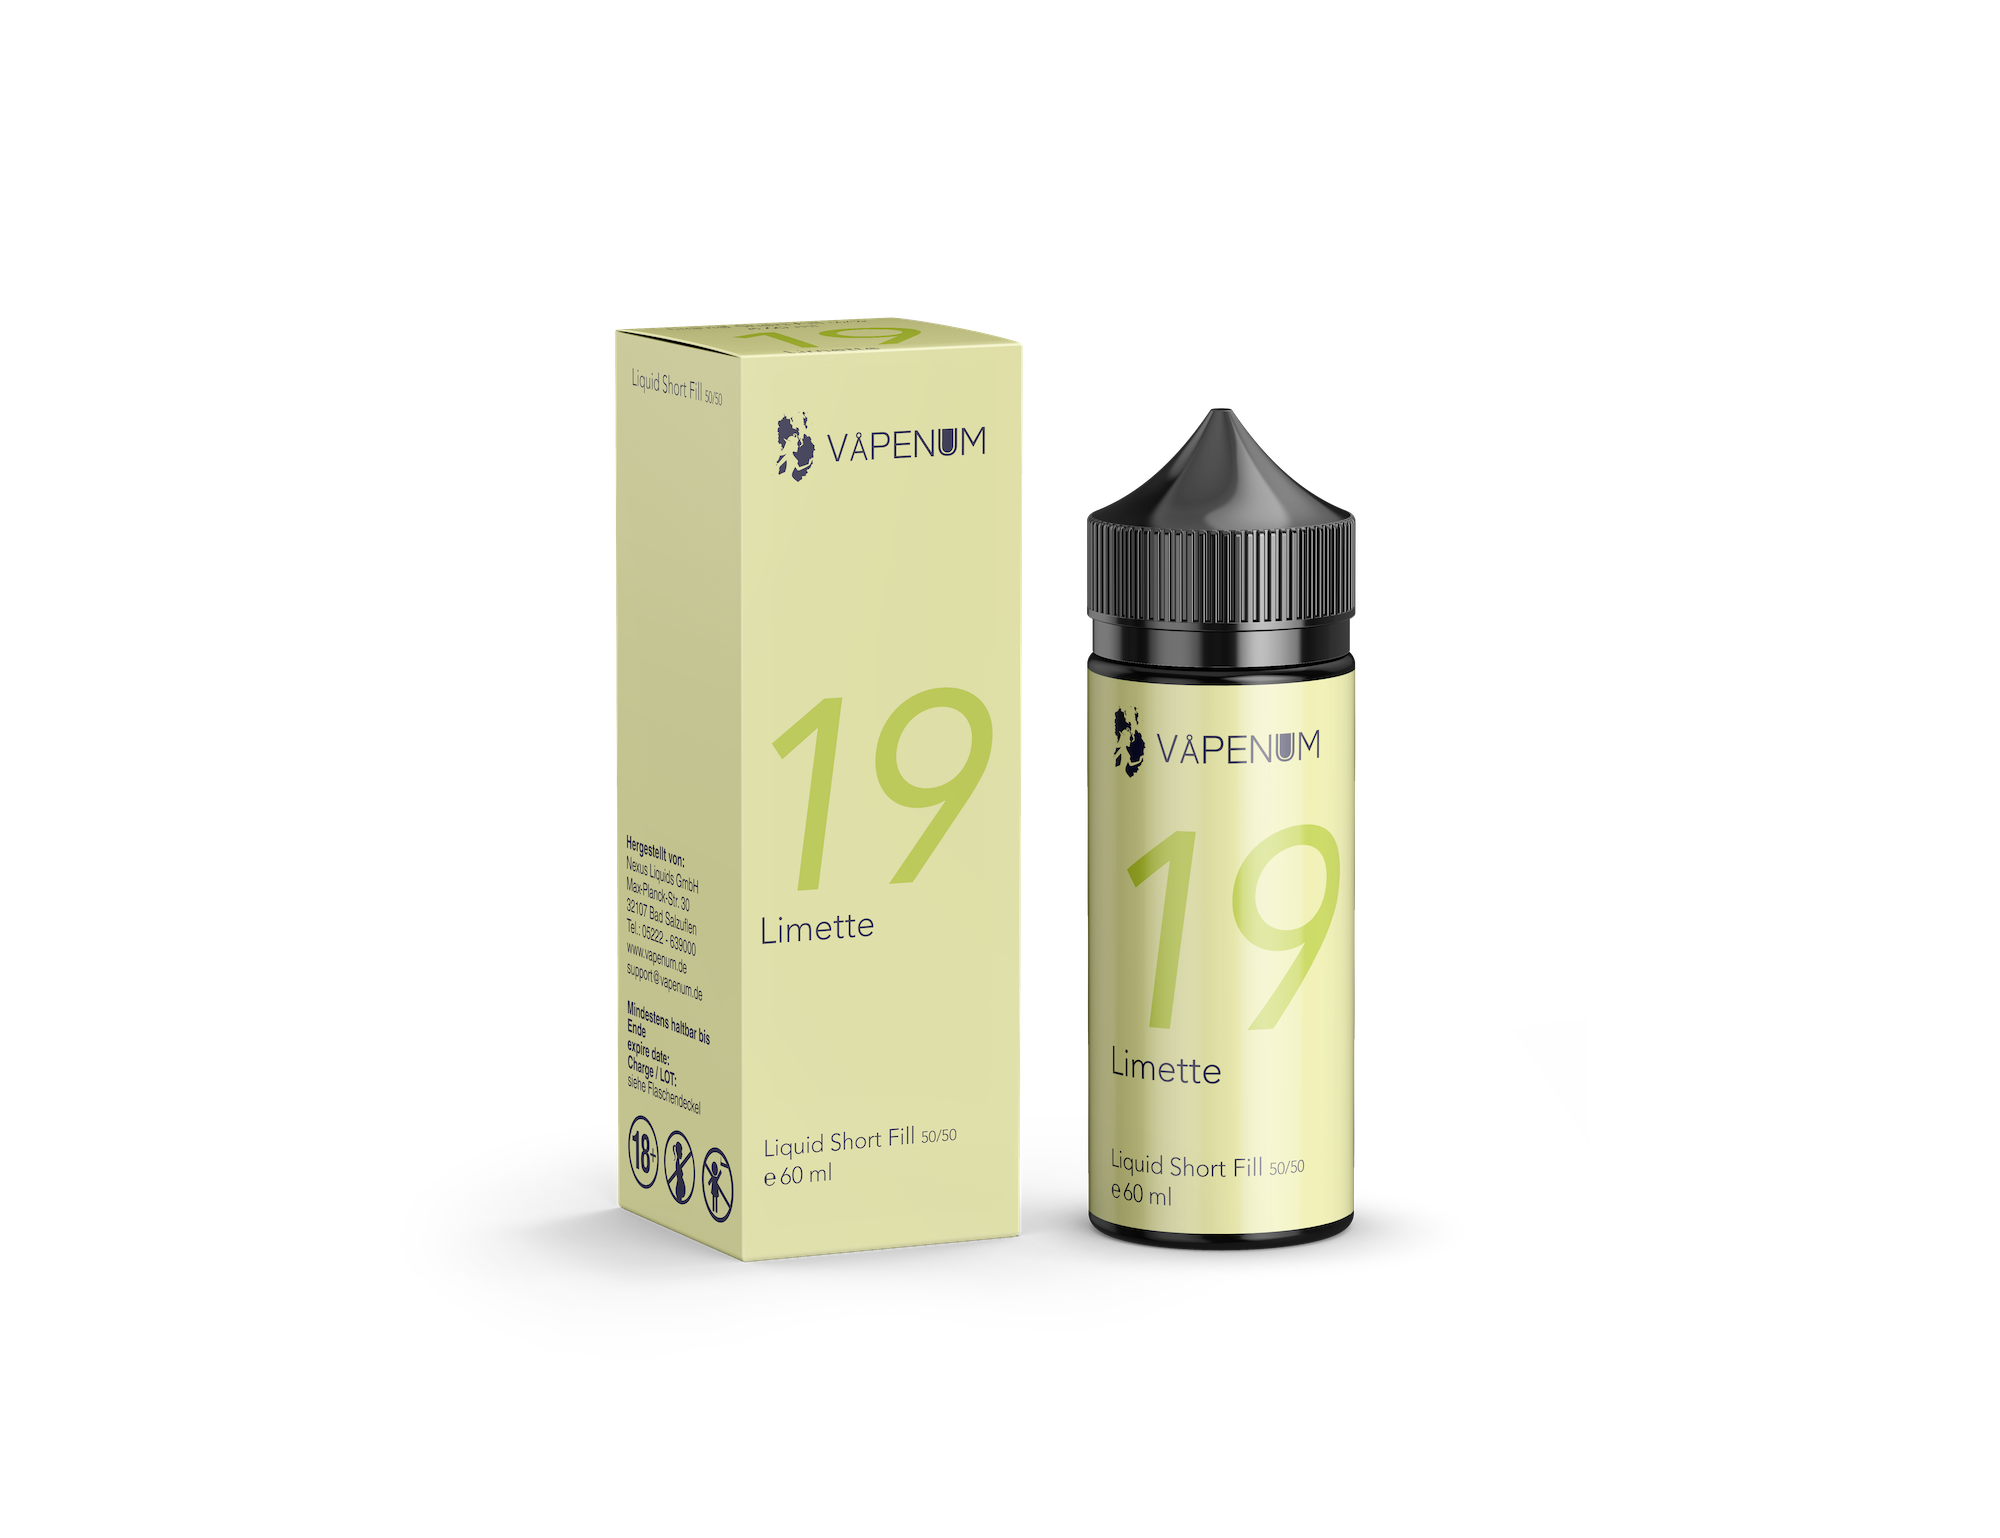 Vapenum Shortfill 19 - Limette